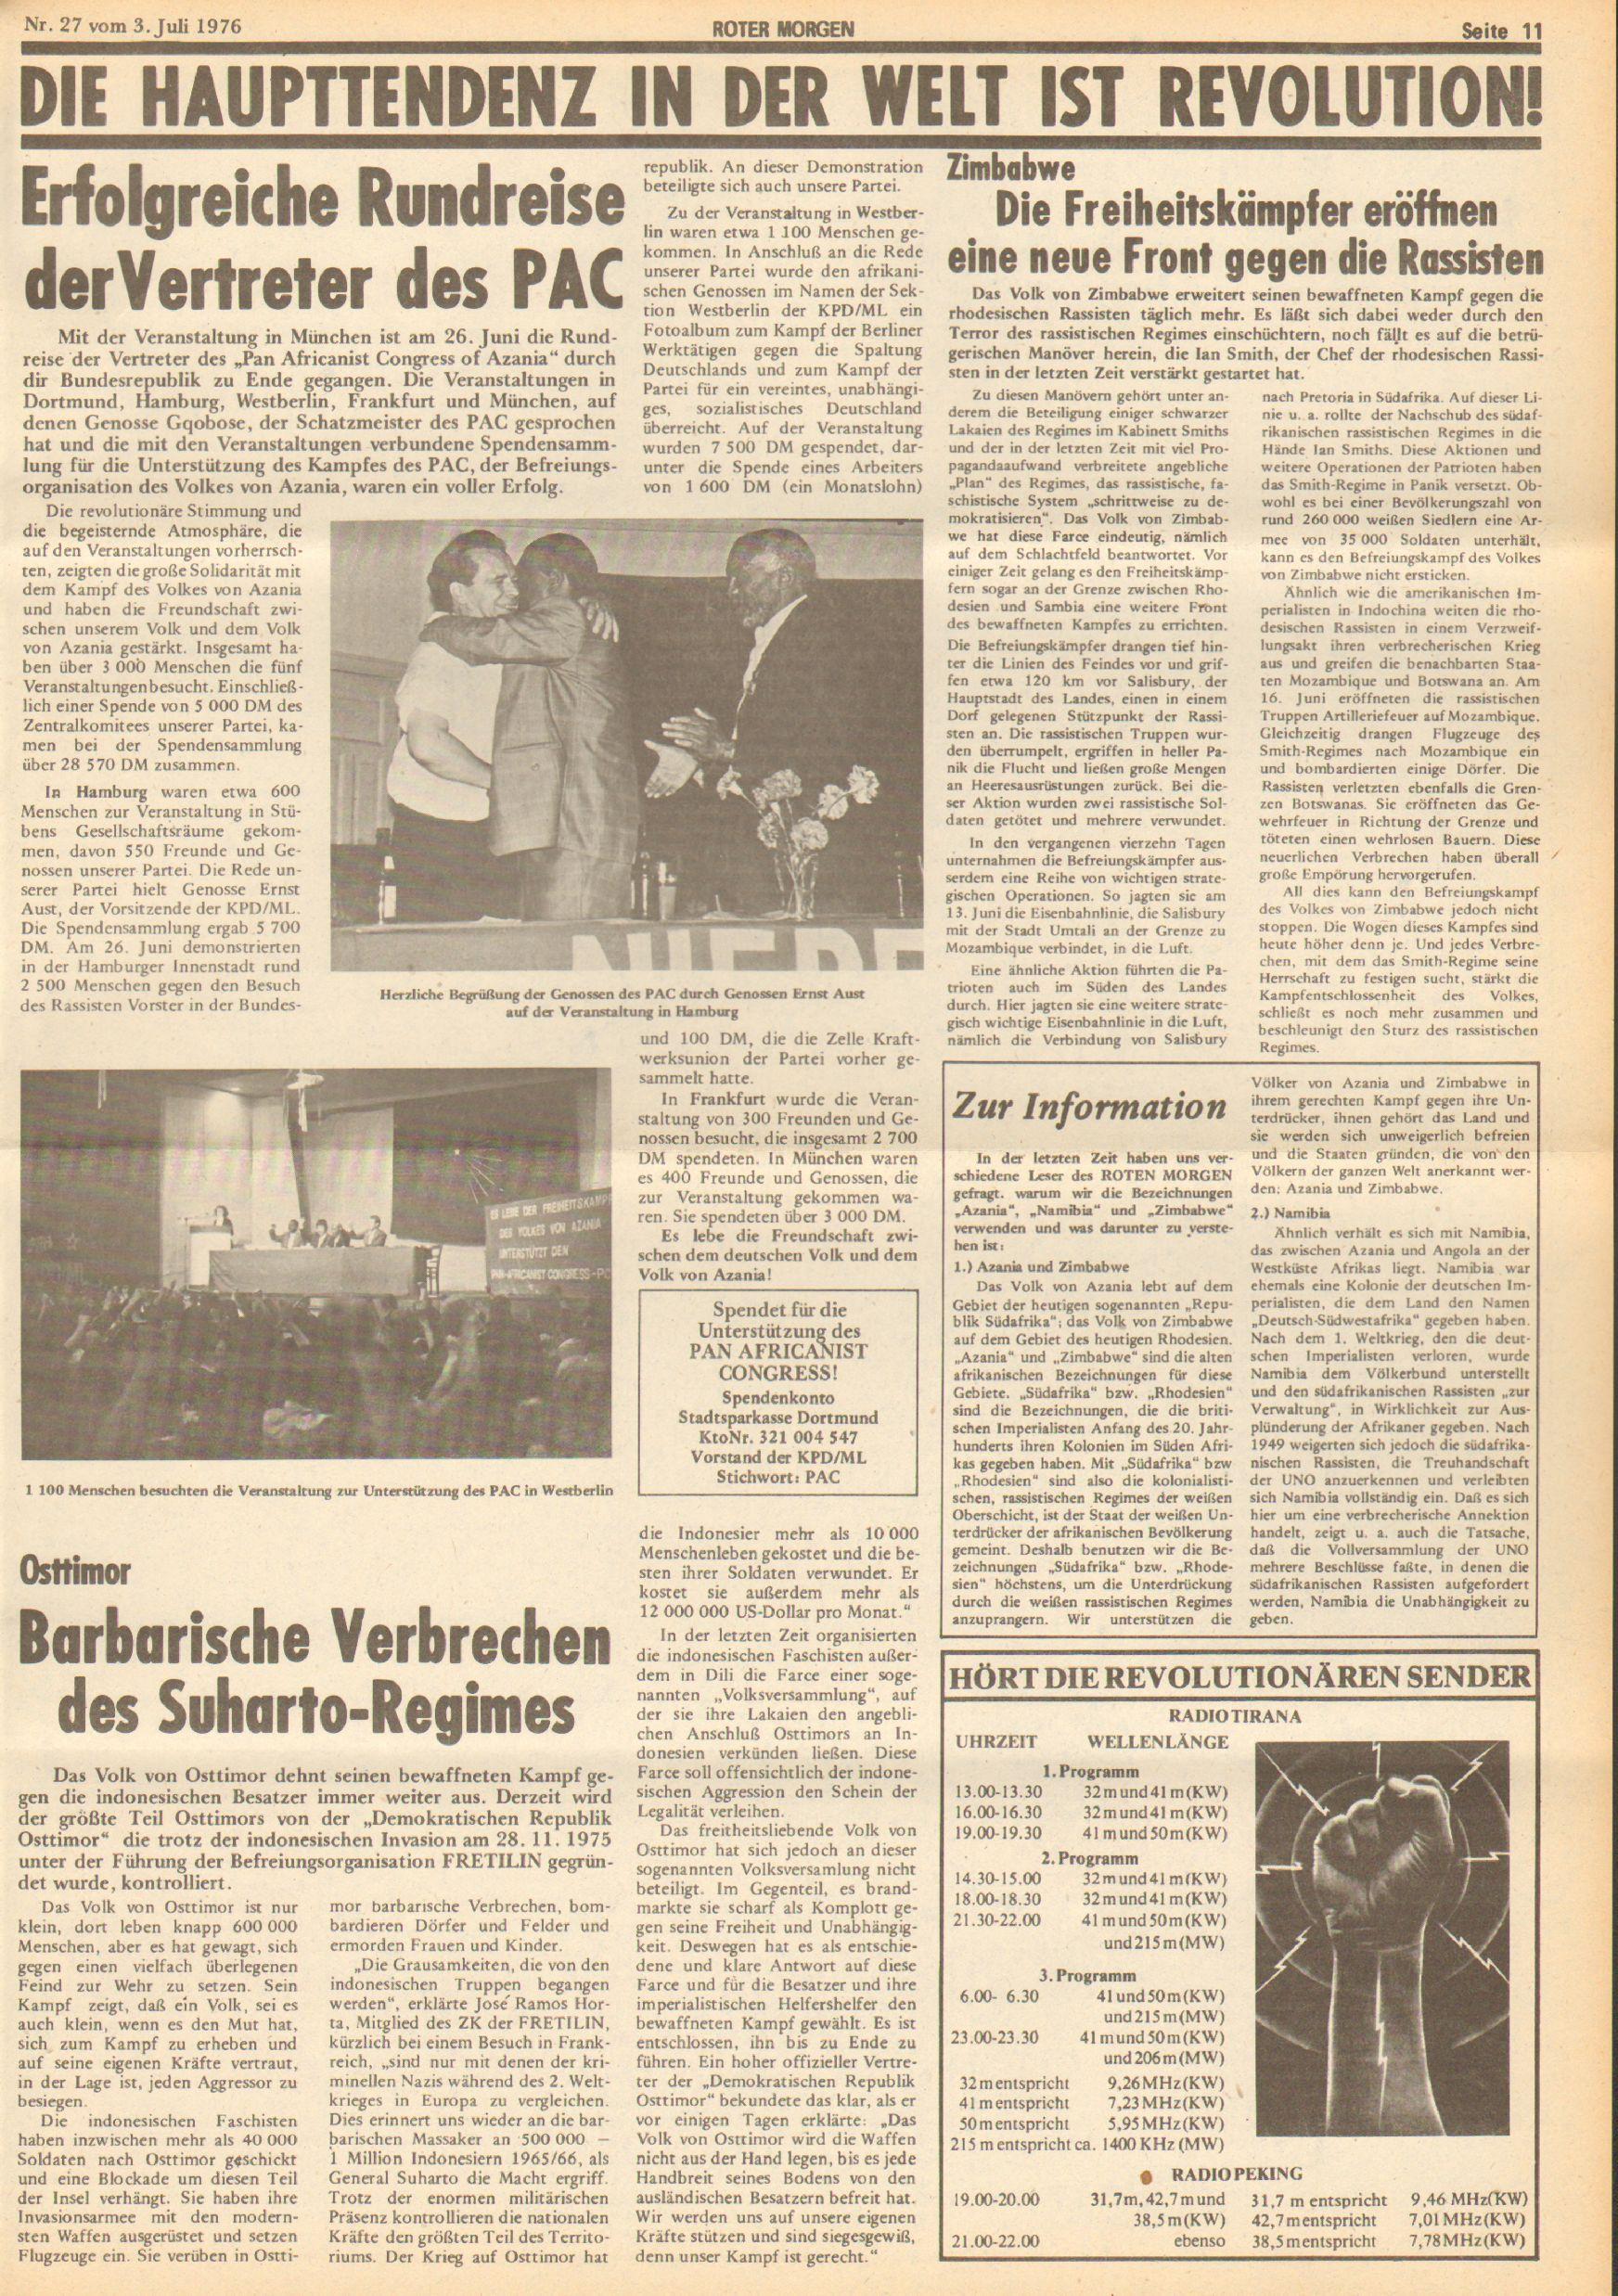 Roter Morgen, 10. Jg., 3. Juli 1976, Nr. 27, Seite 11